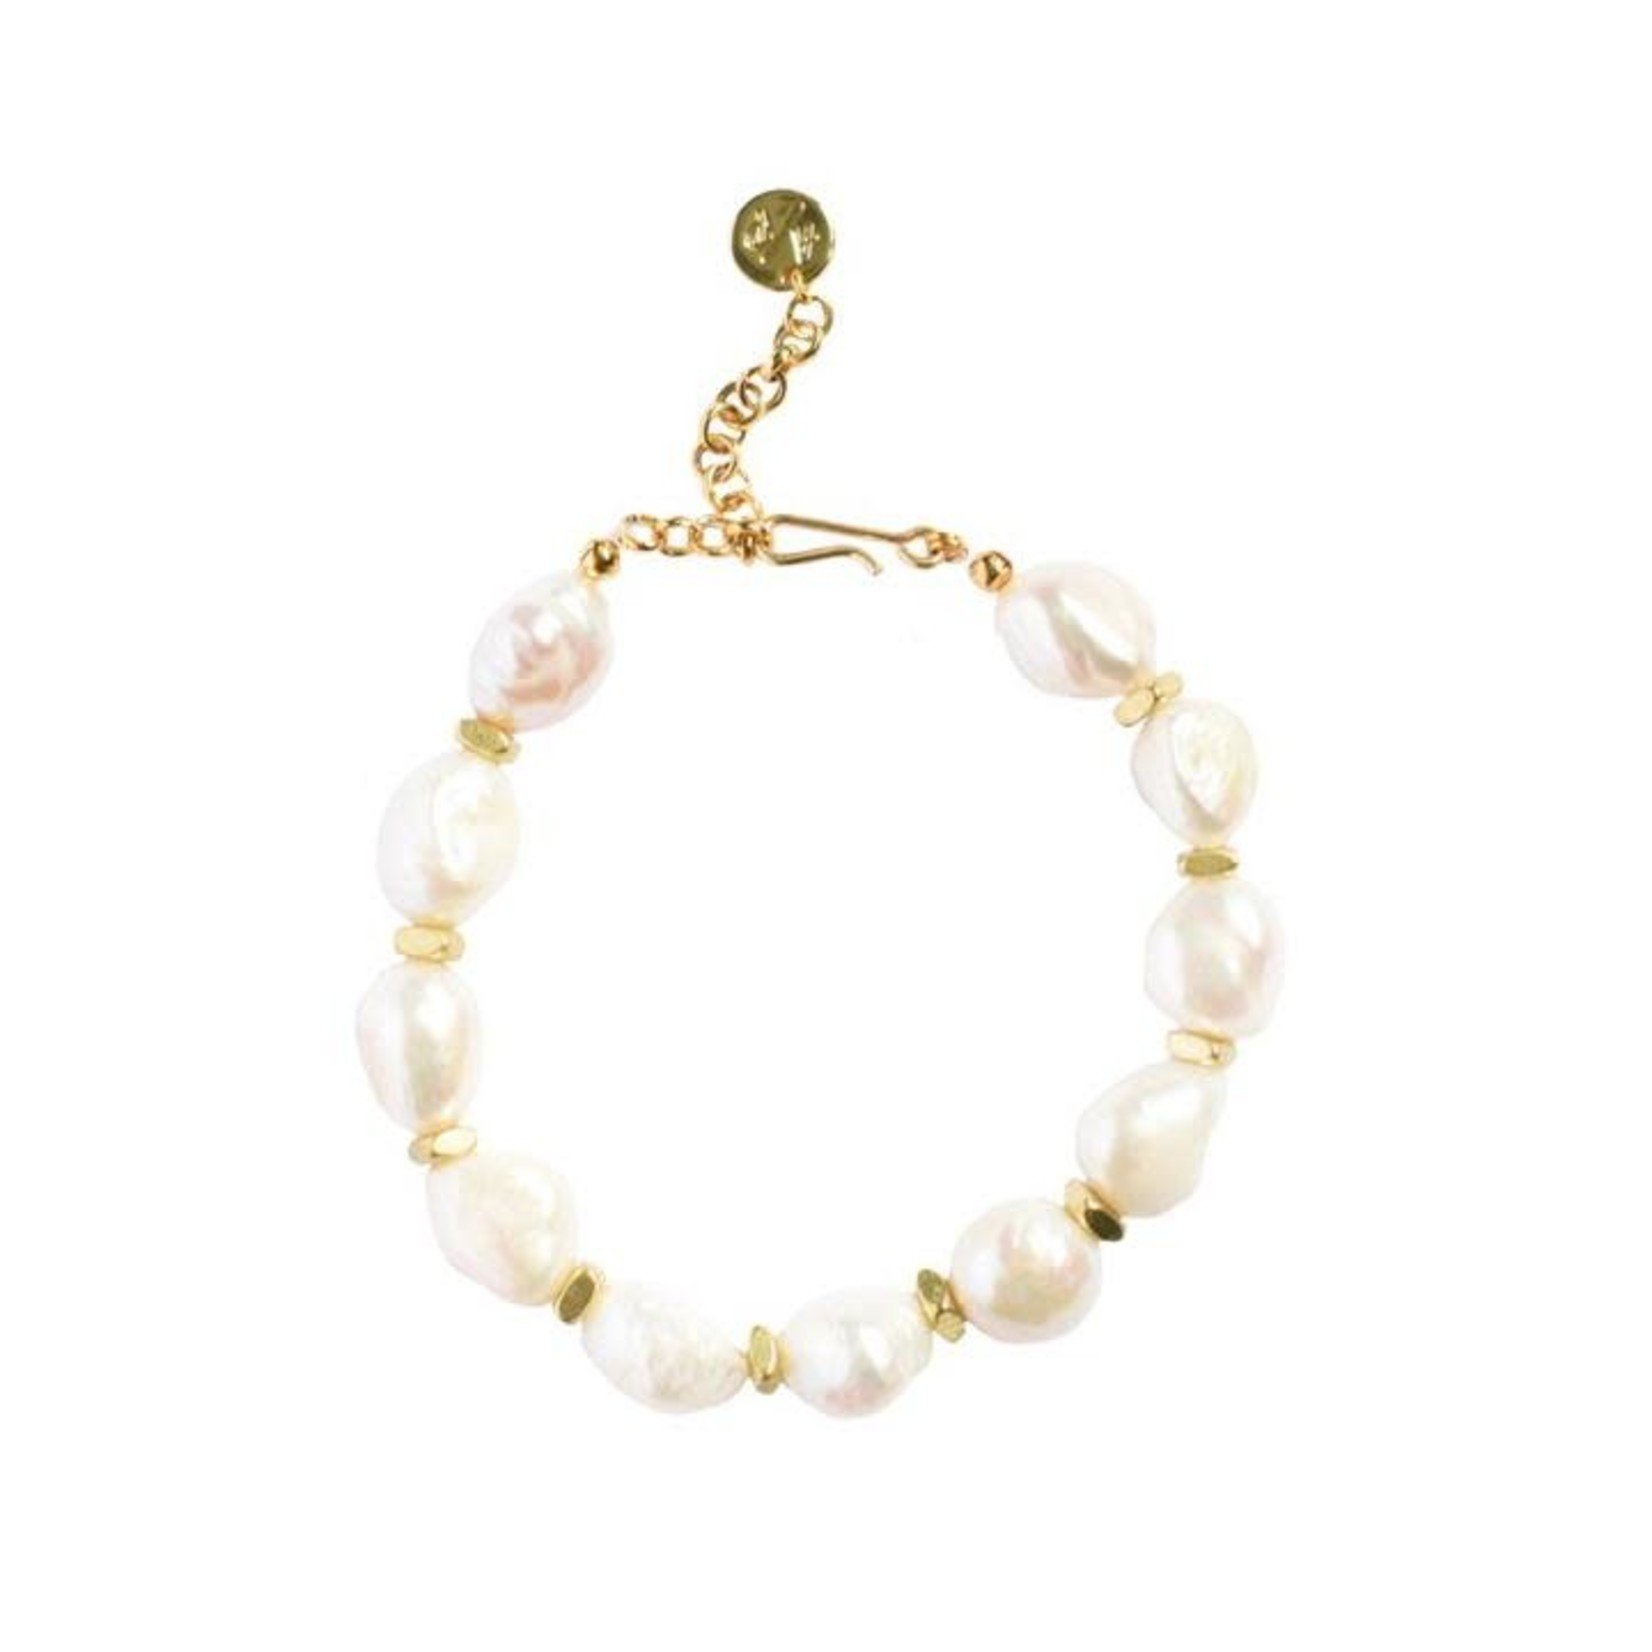 Adriana Pappas Pearl Nugget Bracelet